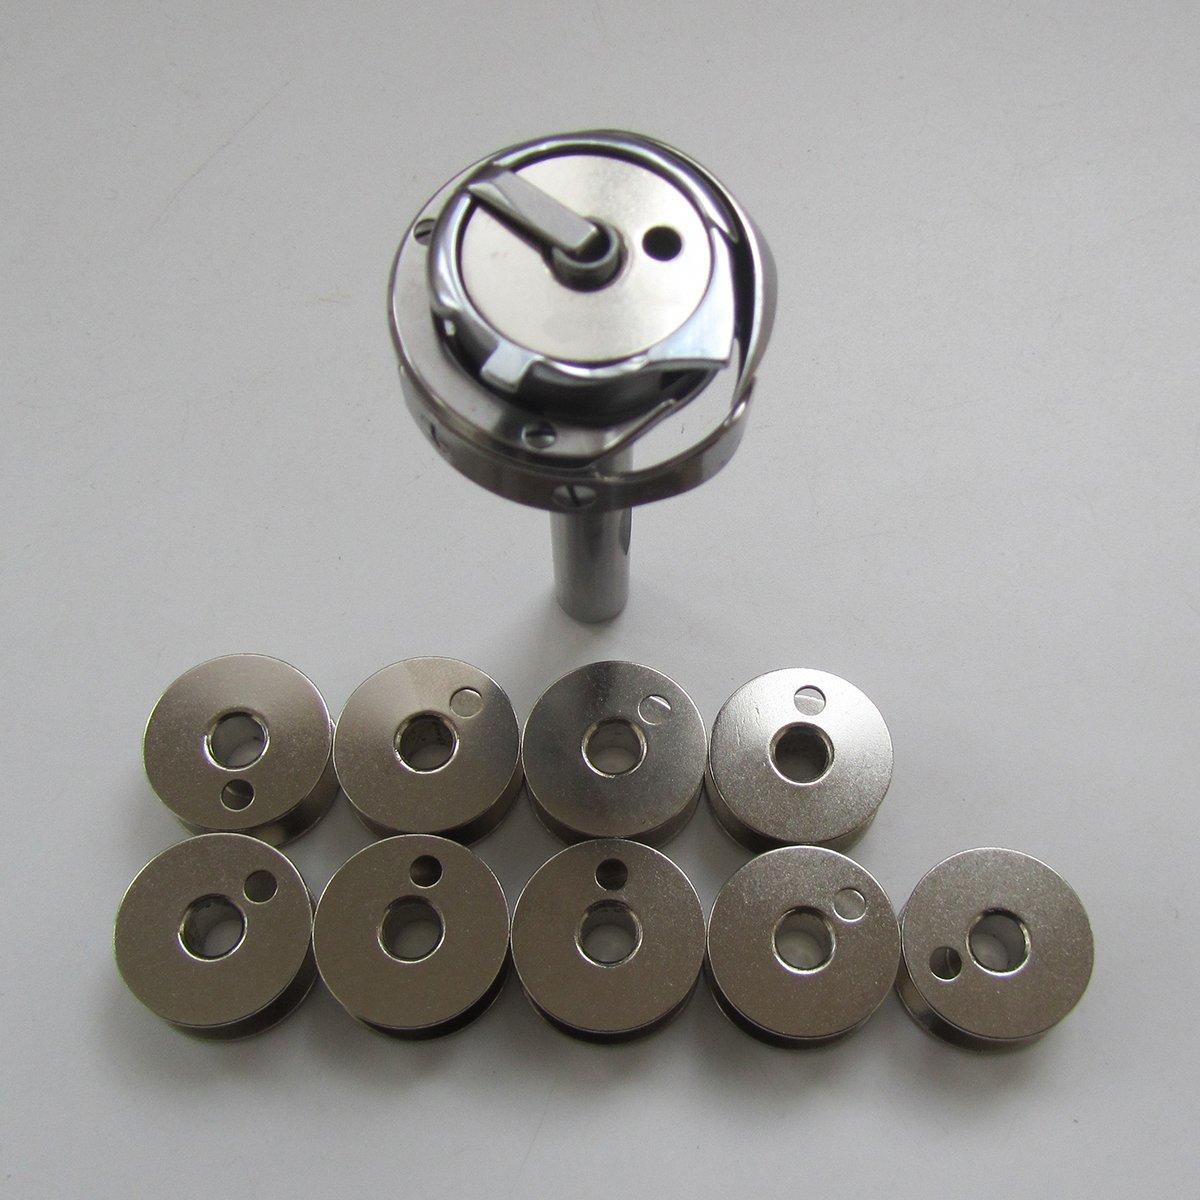 1PCS #HSH-11-55 Hook fit for Singer 111W155 CONSEW 224 225 226 JUKI LU-562 Seiko Sewing Machines CKPSMS Brand HSH-11-55